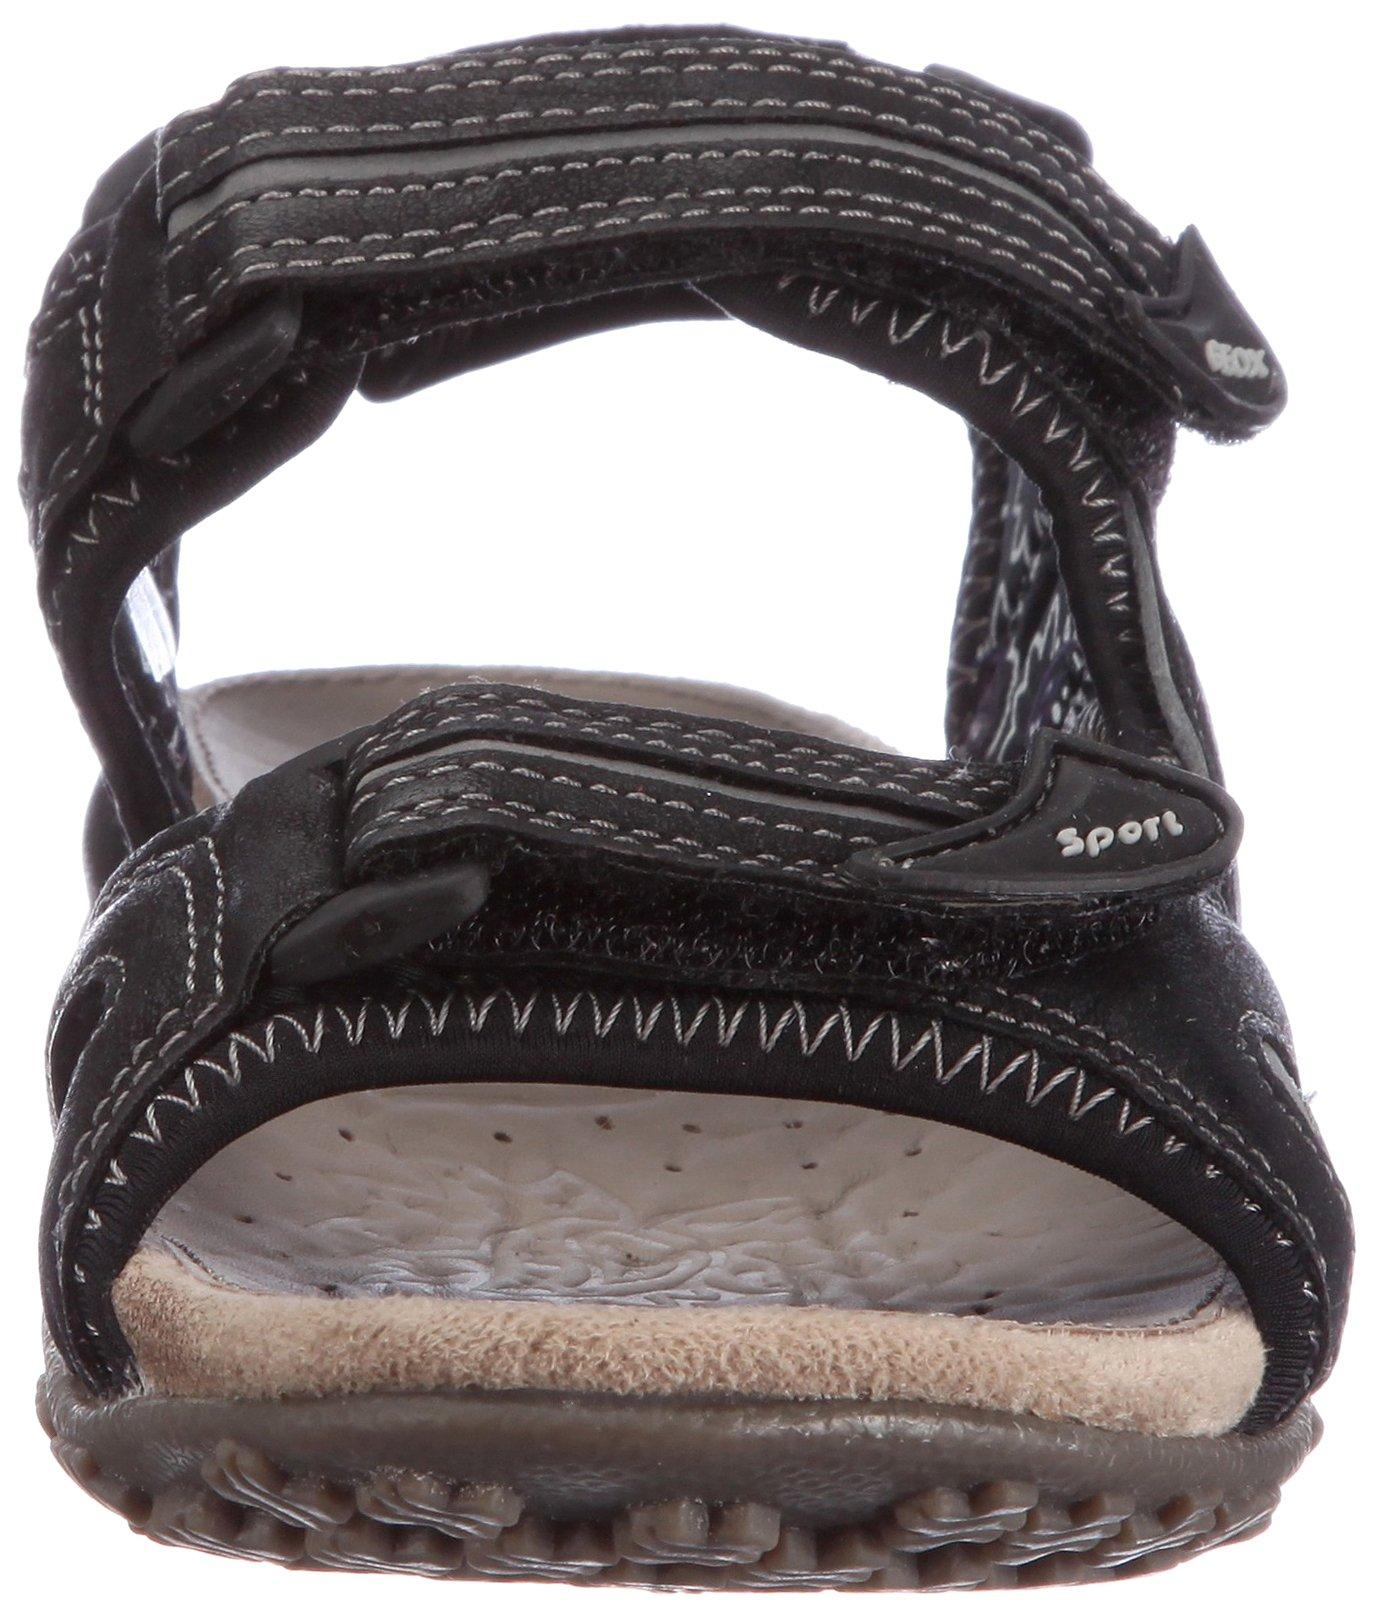 Geox Donna Strel D1125C05415C9999 Damen Sandalen/Fashion-Sandalen 4